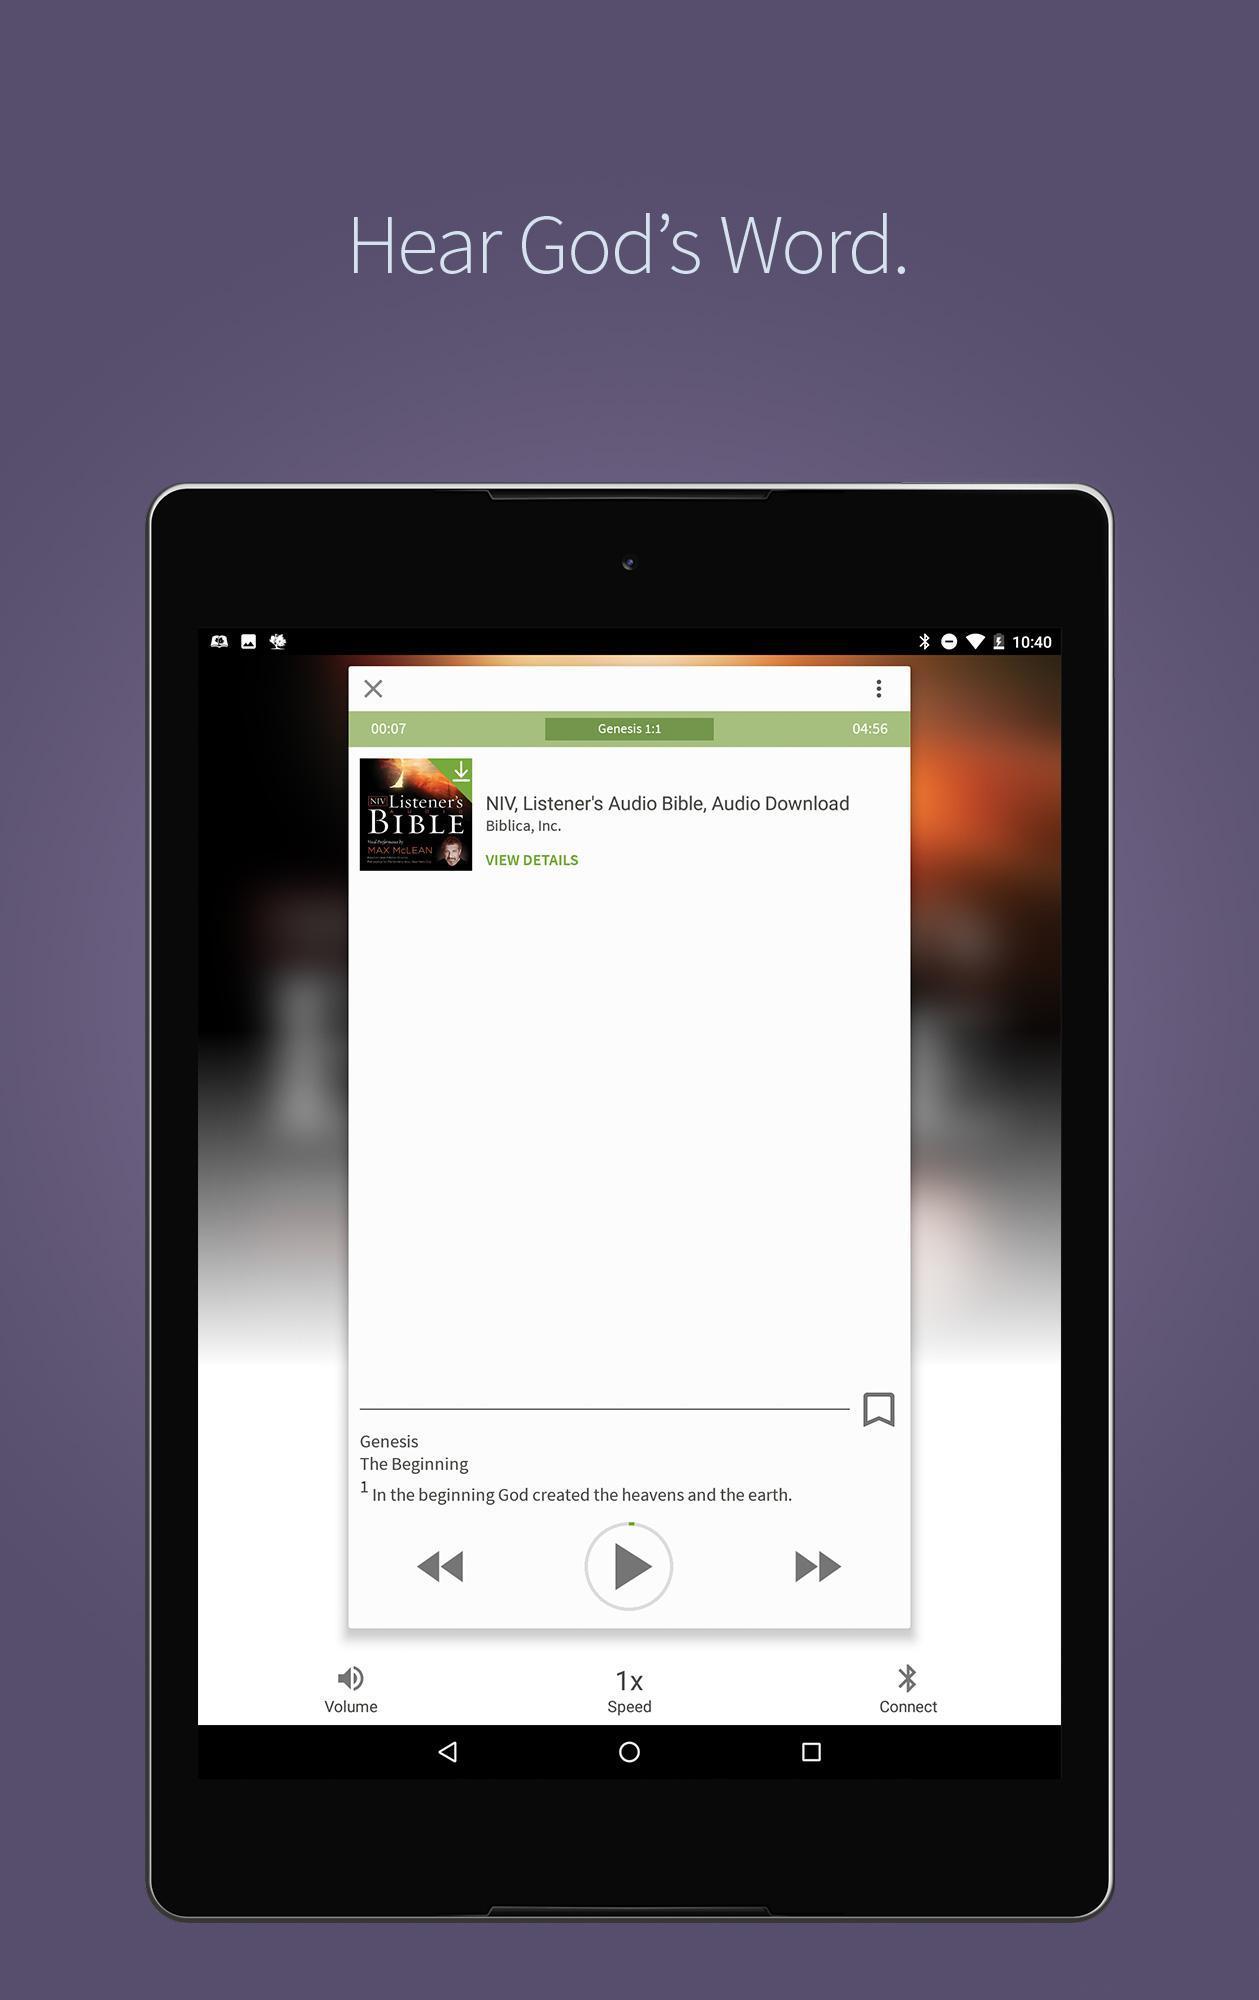 Bible App by Olive Tree 7.5.4.0.5664 Screenshot 10